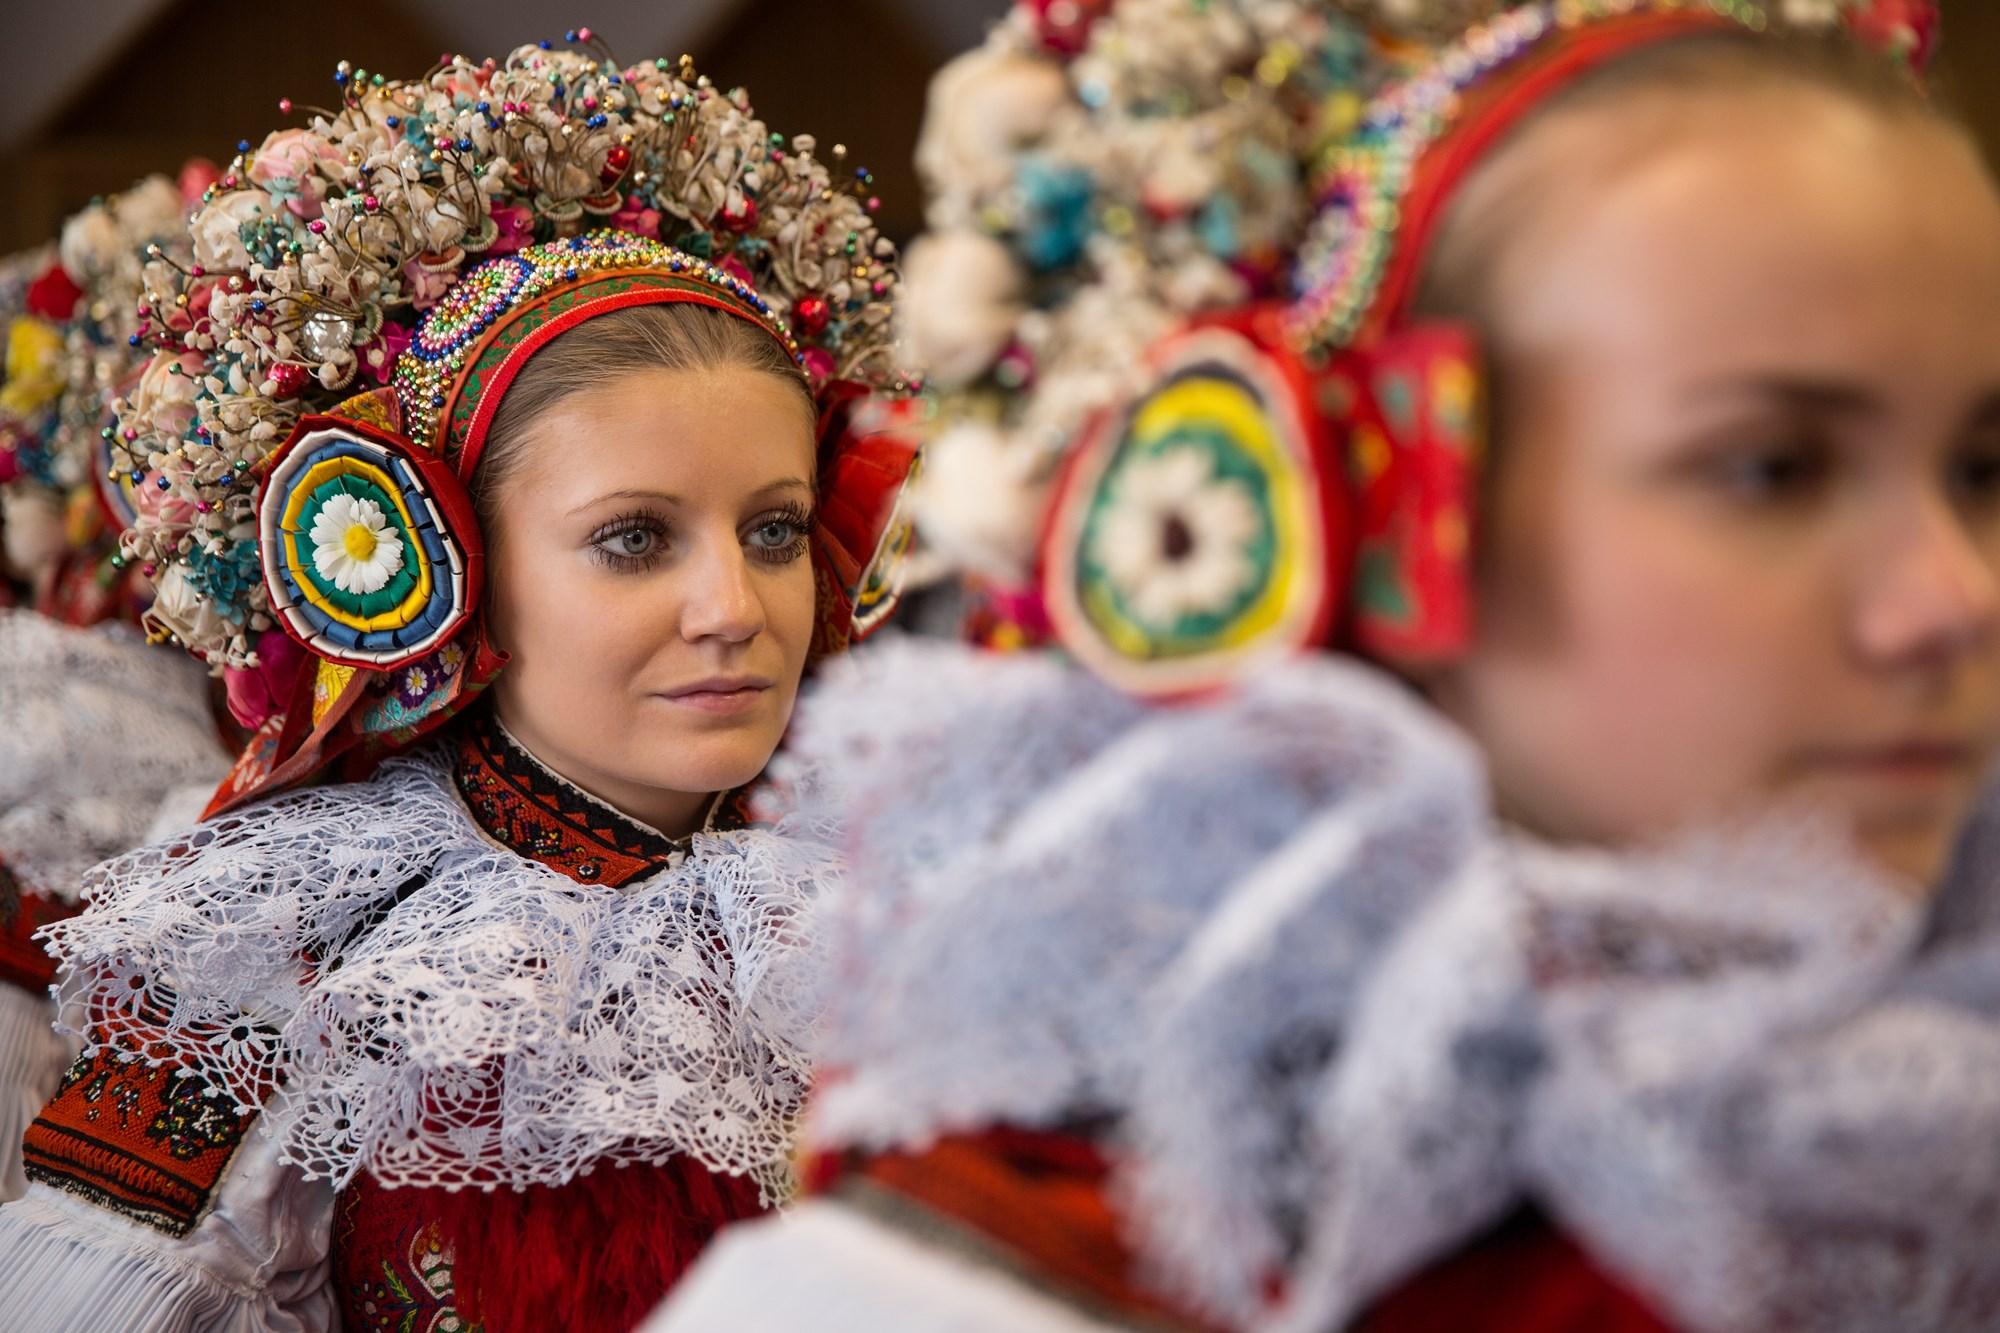 Czechoslovakia dating culture in norway